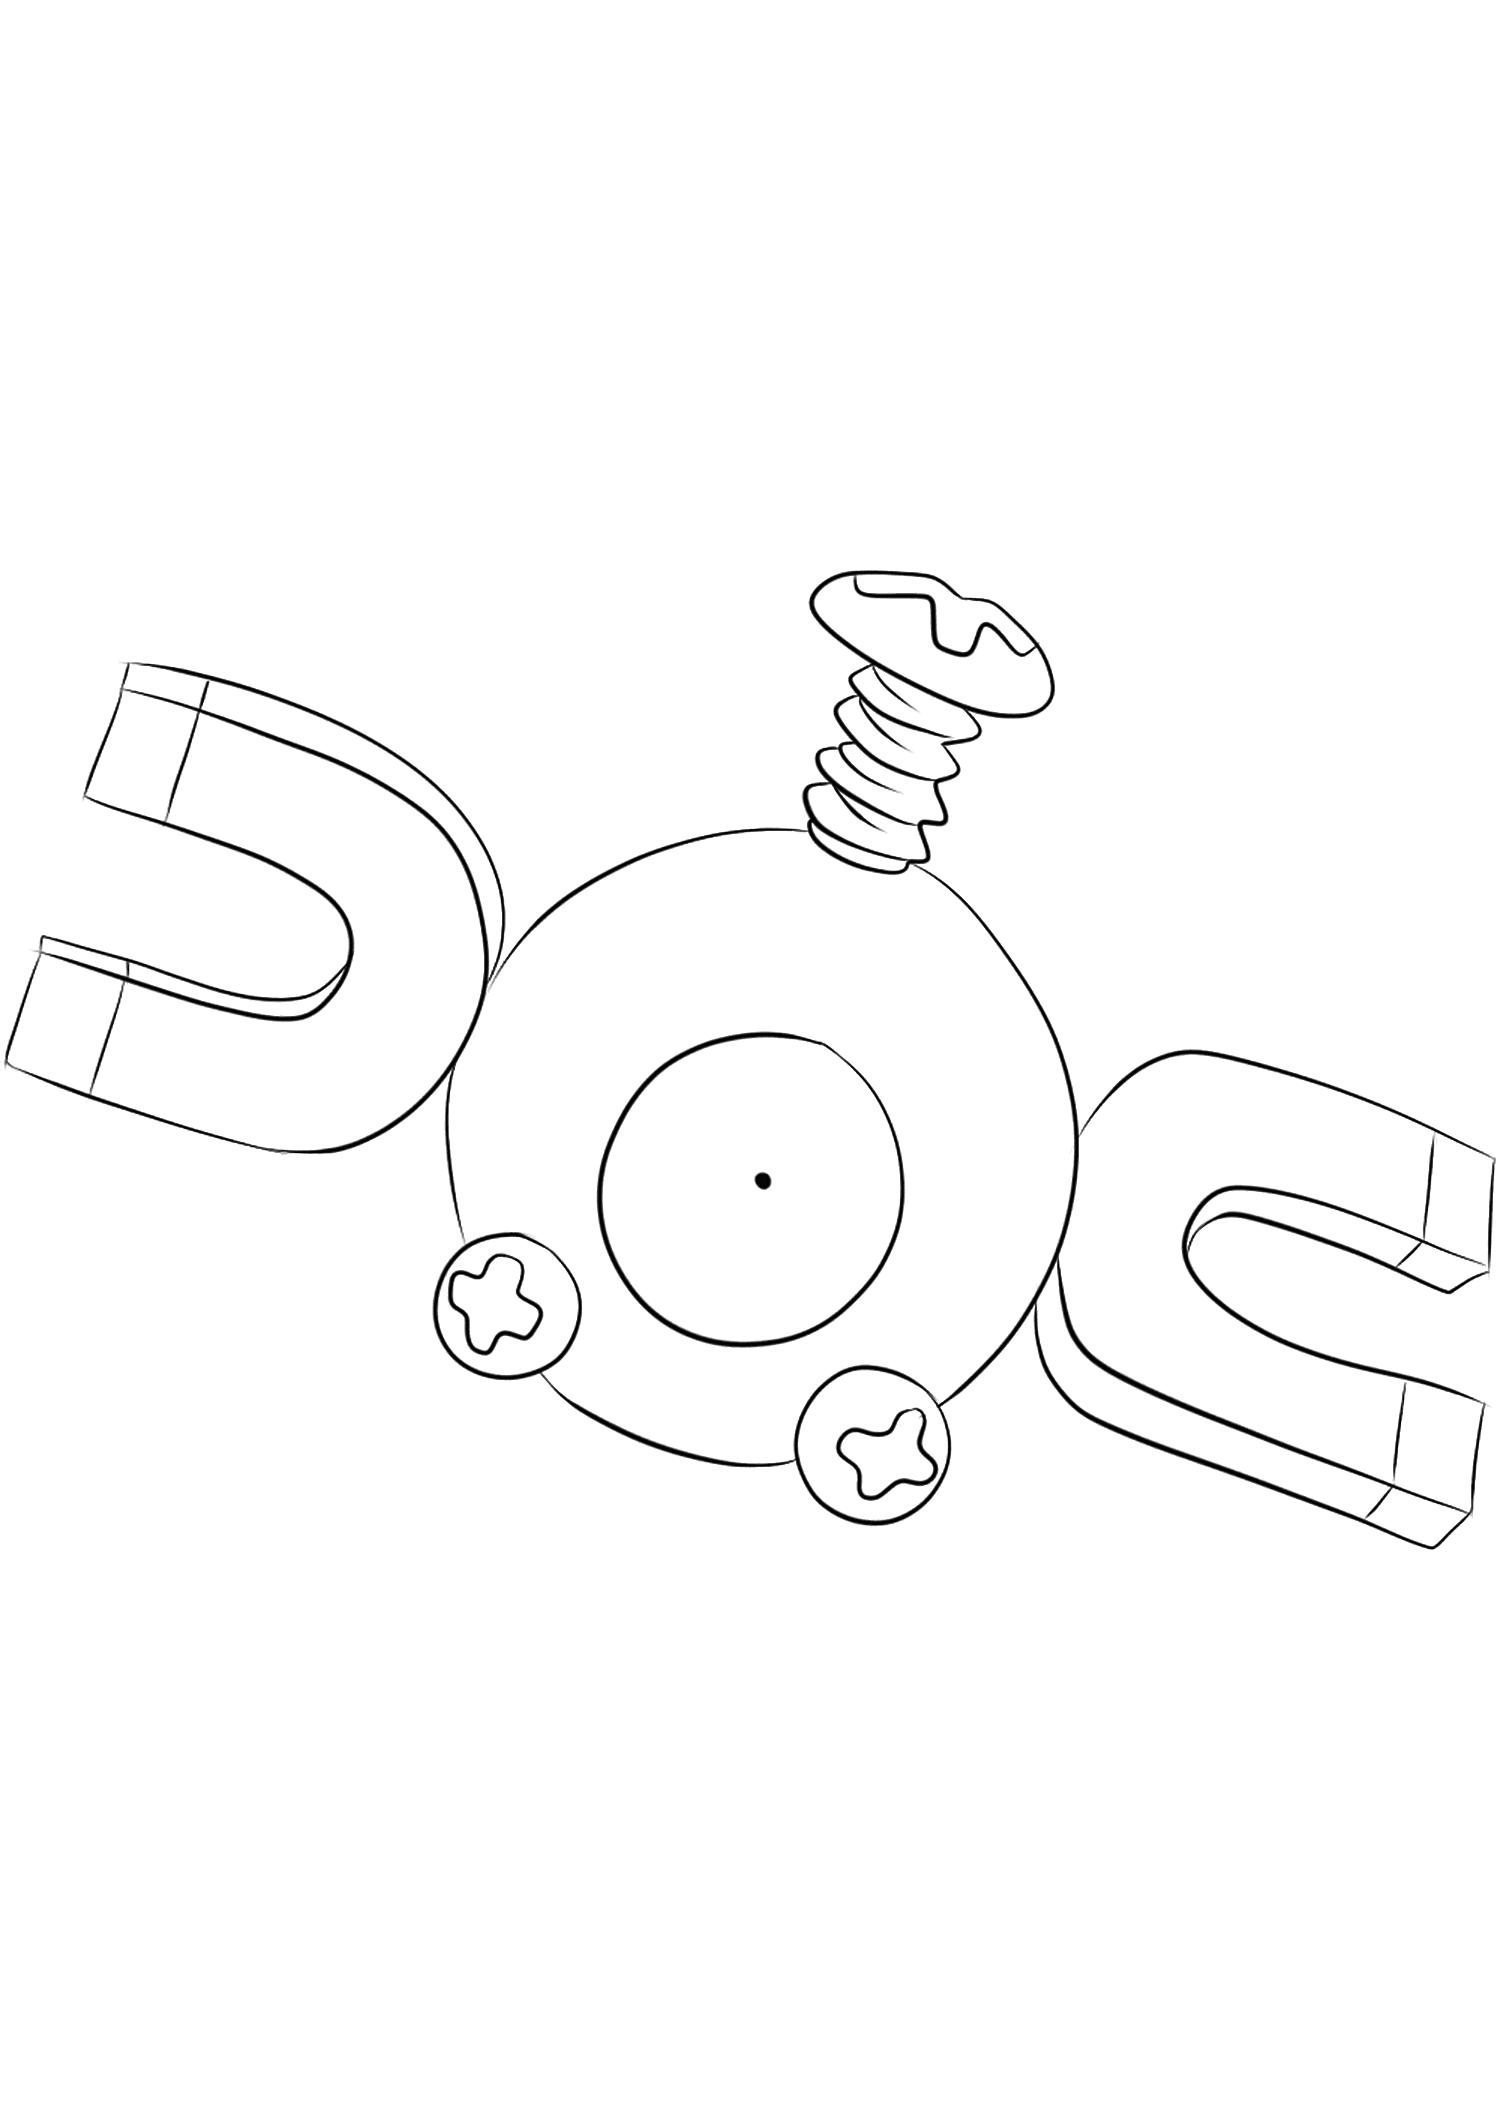 <b>Magnéti</b> (No.81) : Pokémon de génération I